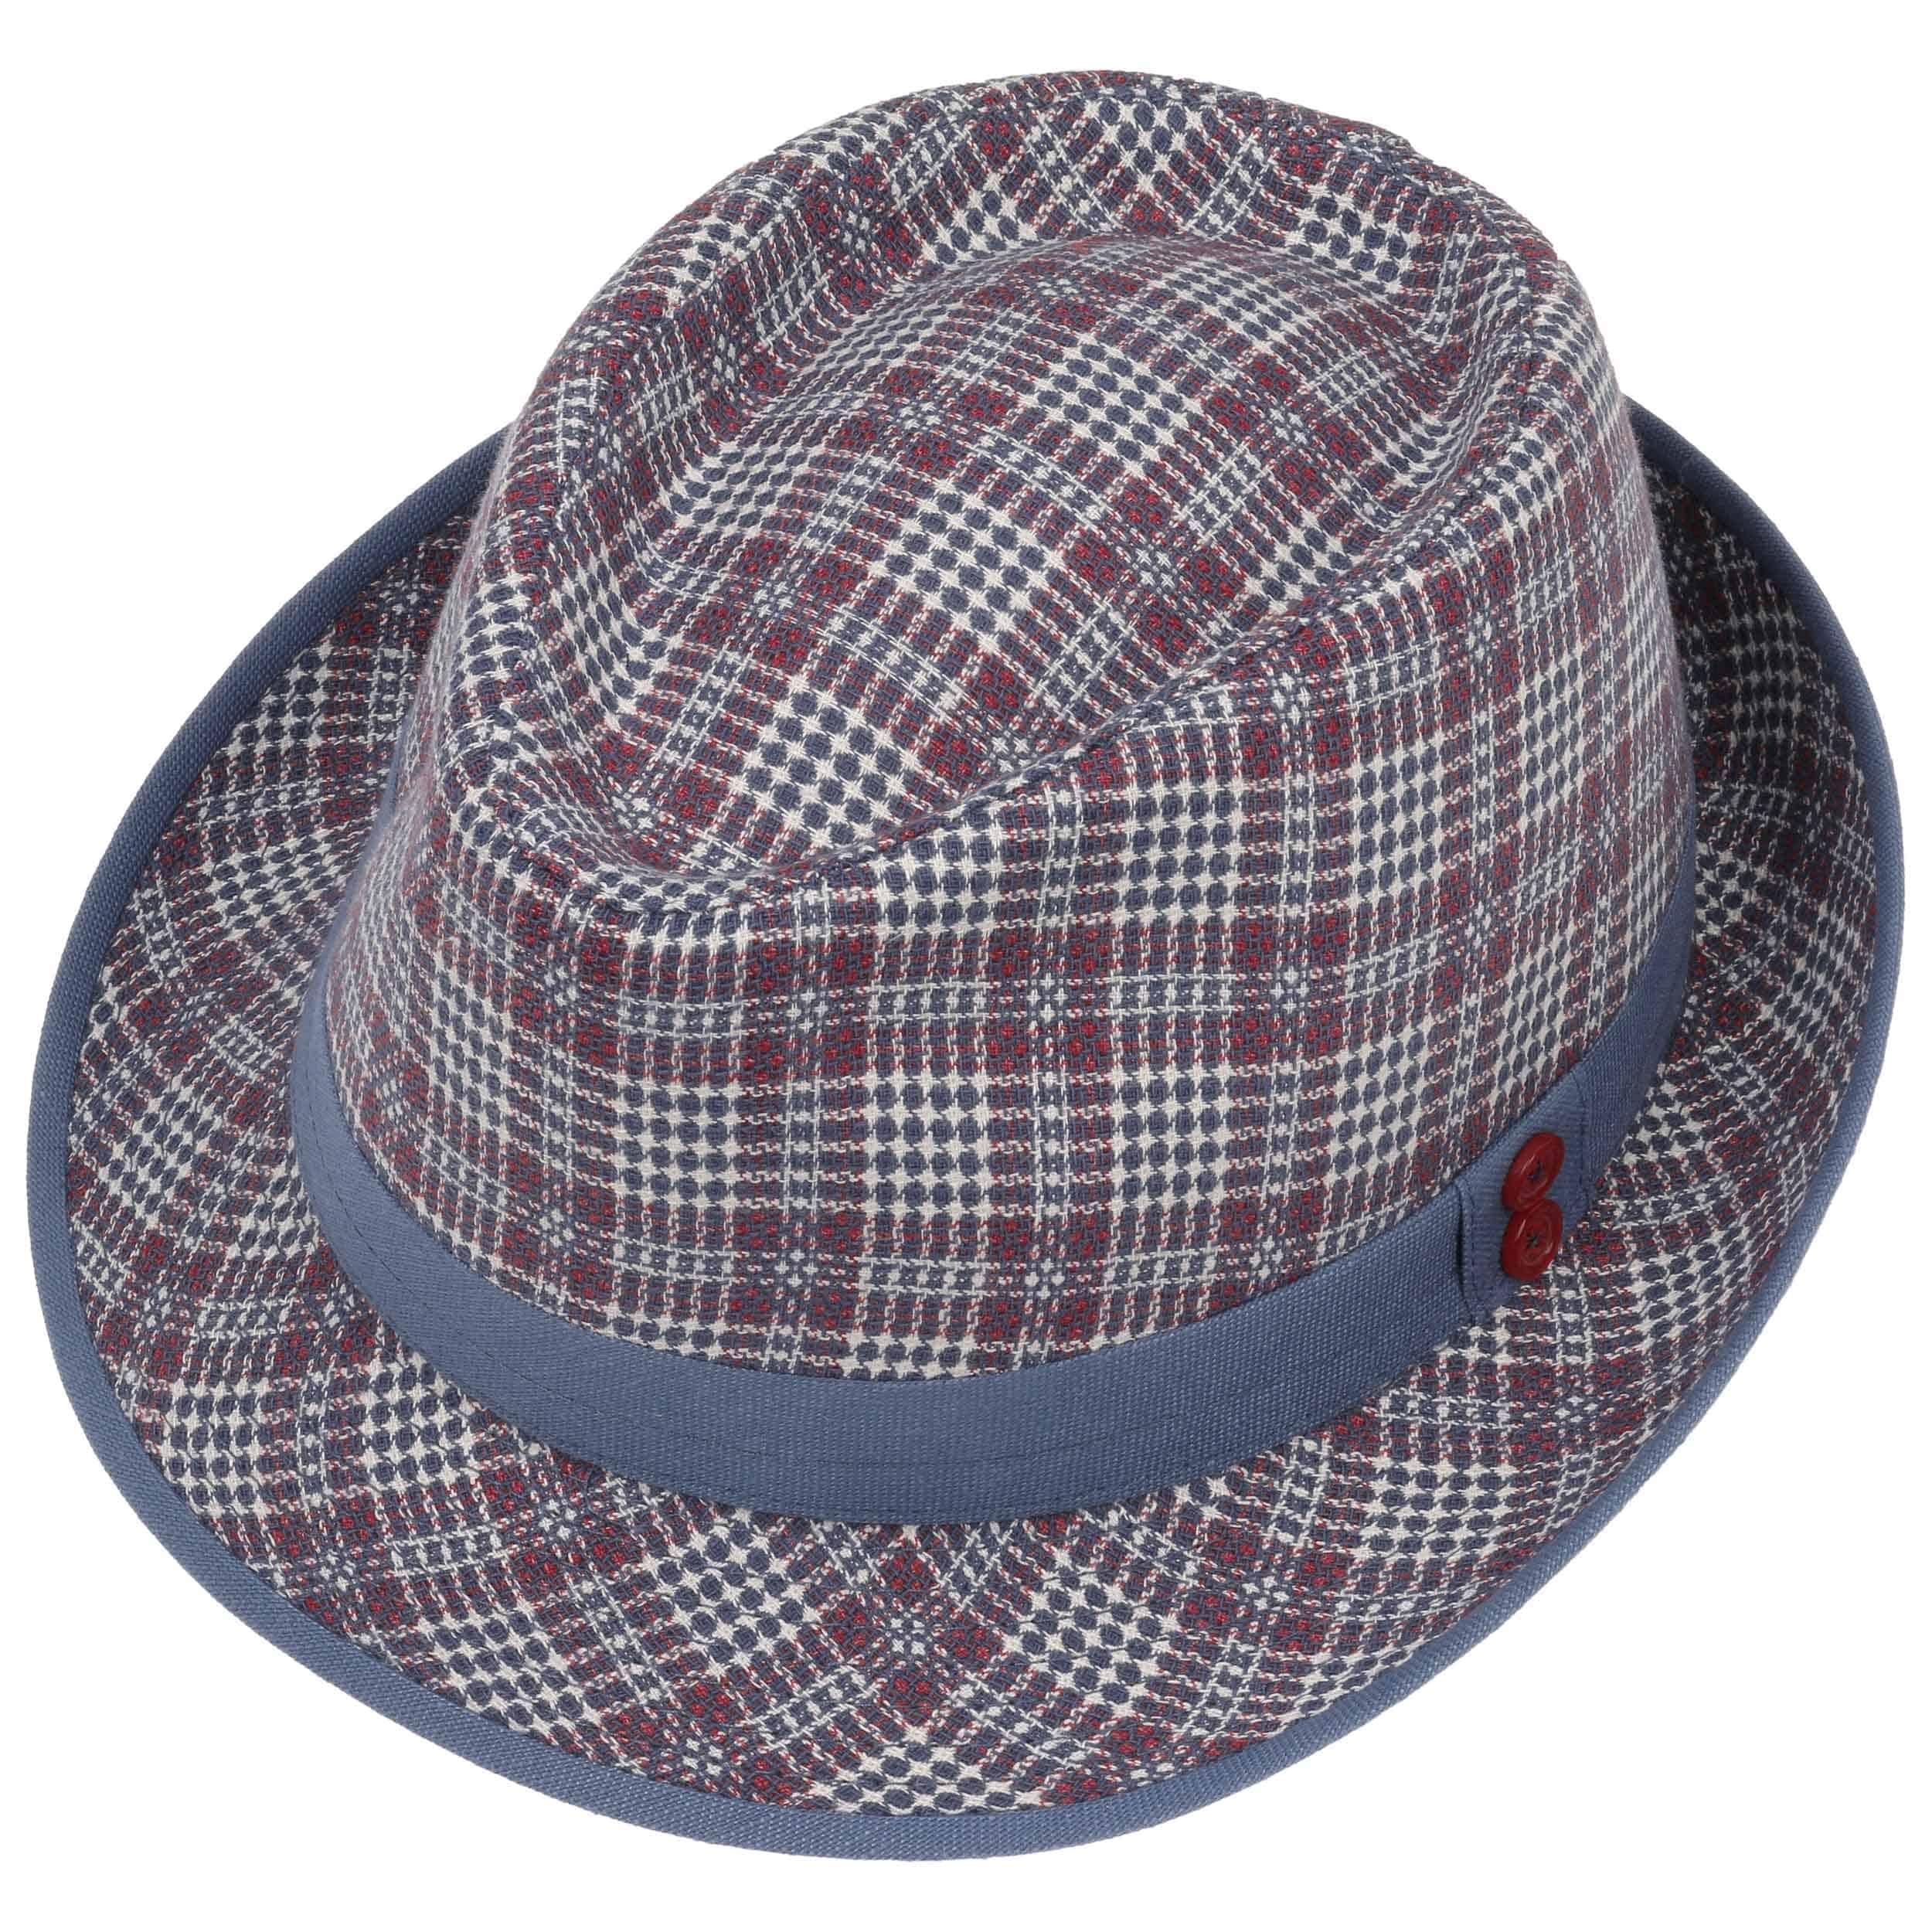 Jeffers Check Trilby Cloth Hat by Lierys Trilby hats Lierys YAu4OuSkZJ